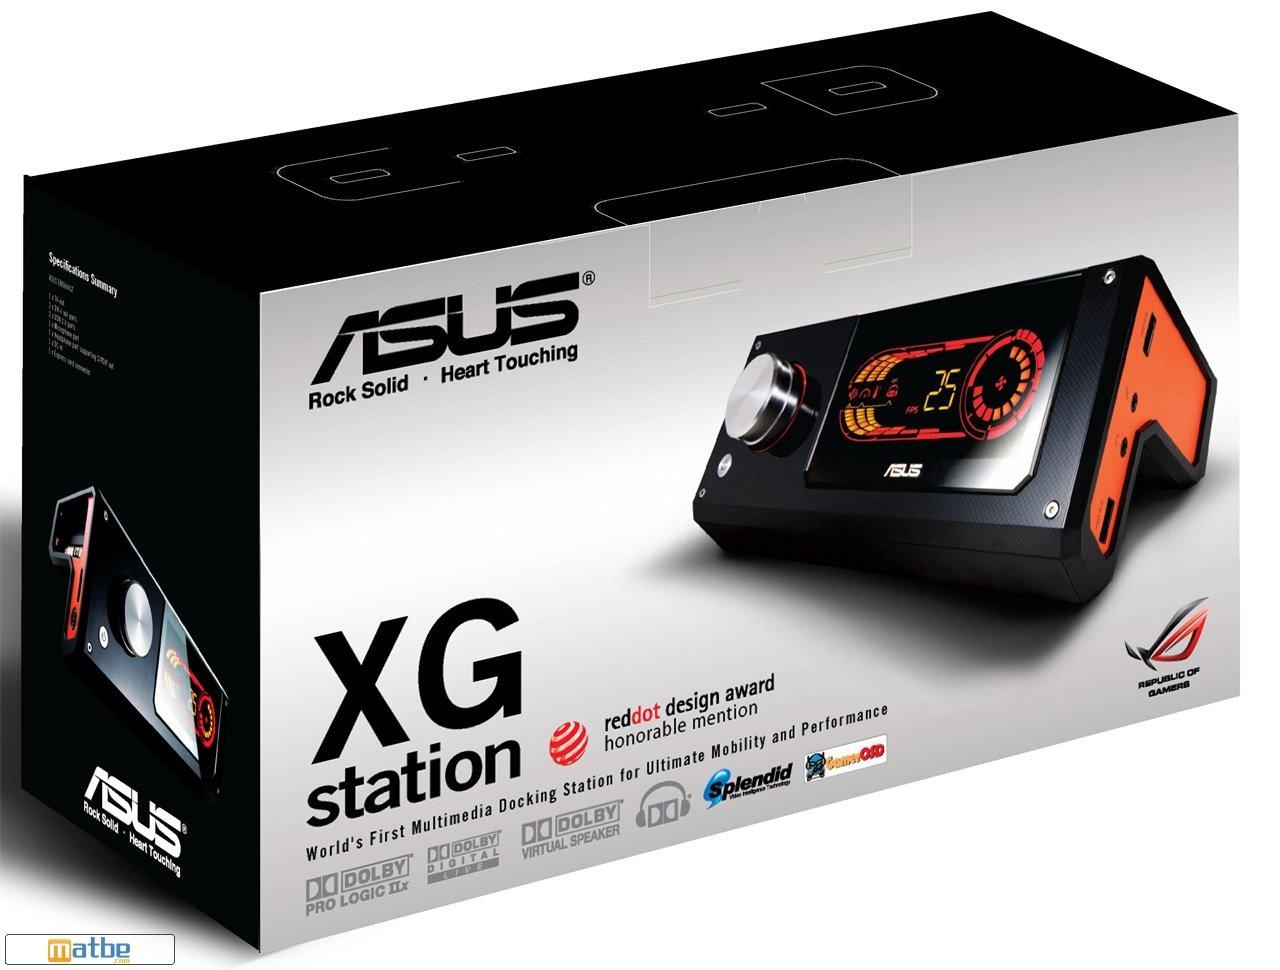 AS ROG XG Station